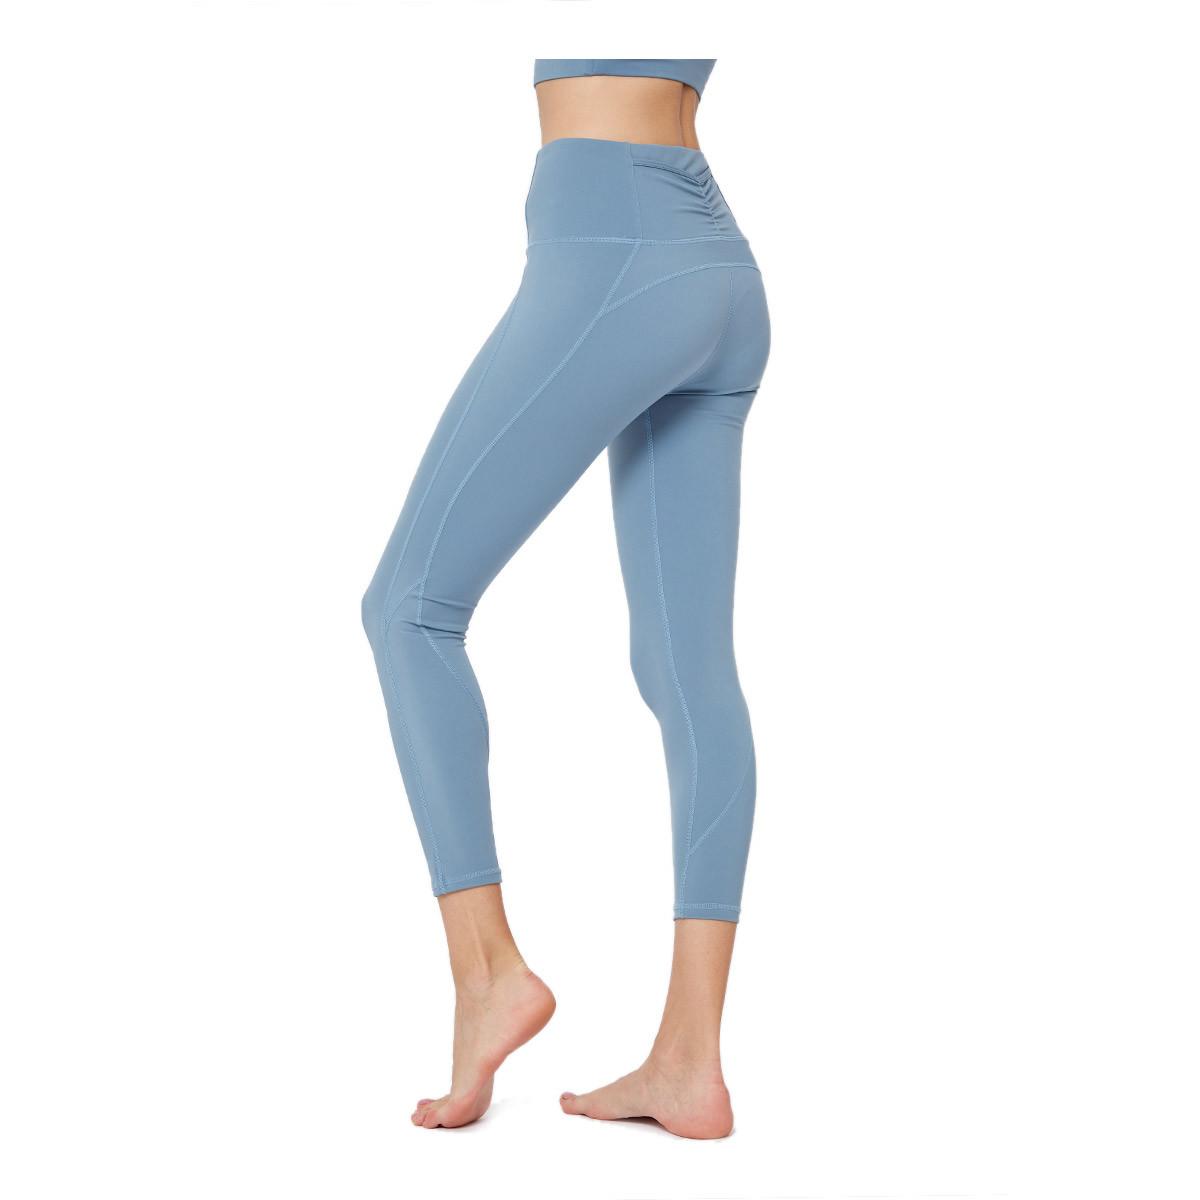 Activewear Leggings Women's Sportswear Pants Manufacturer